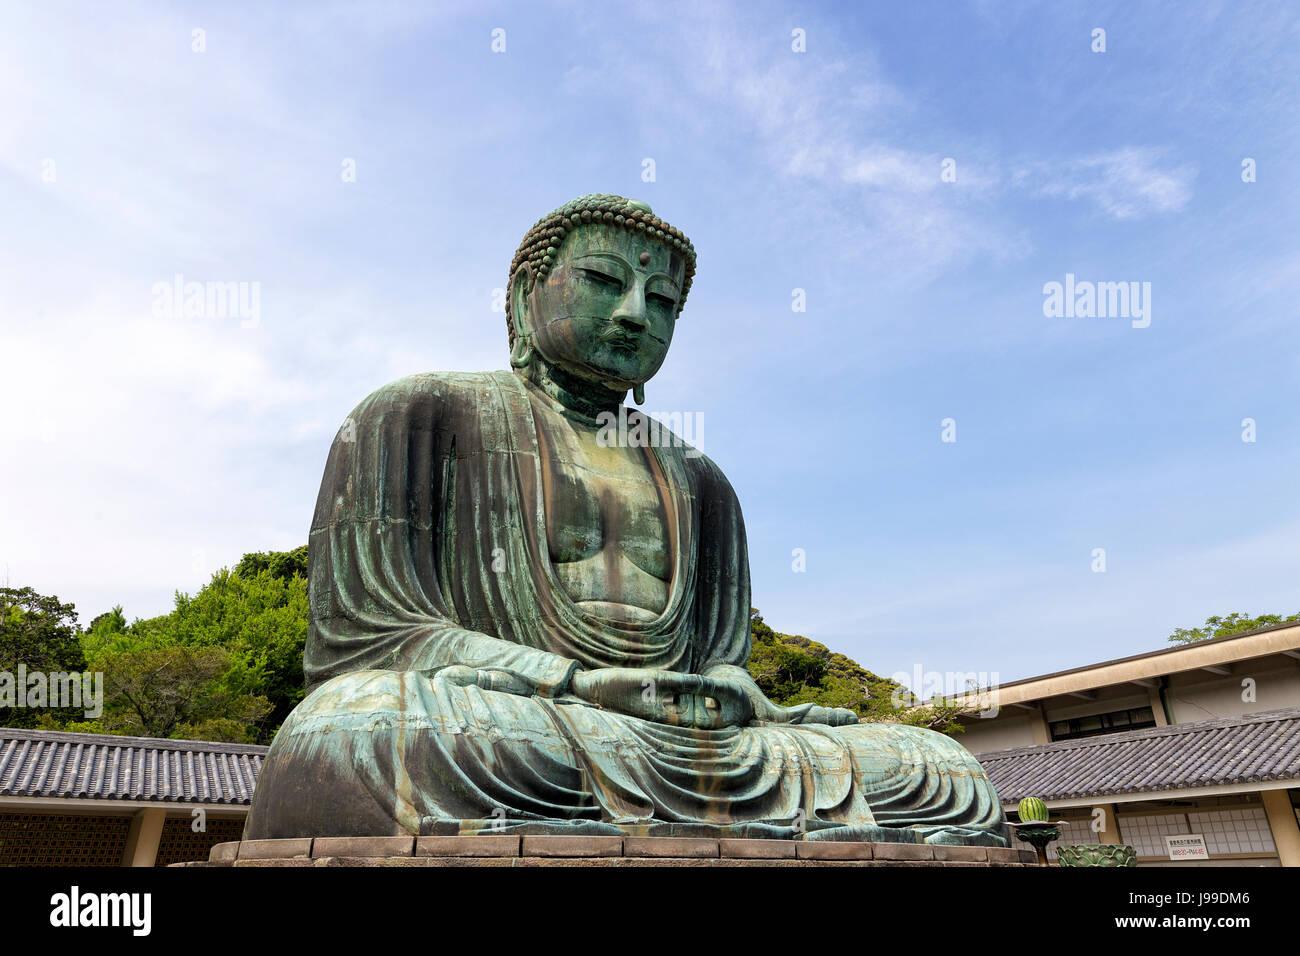 Statue of Buddha at Kamakura Japan nr Tokyo - Stock Image